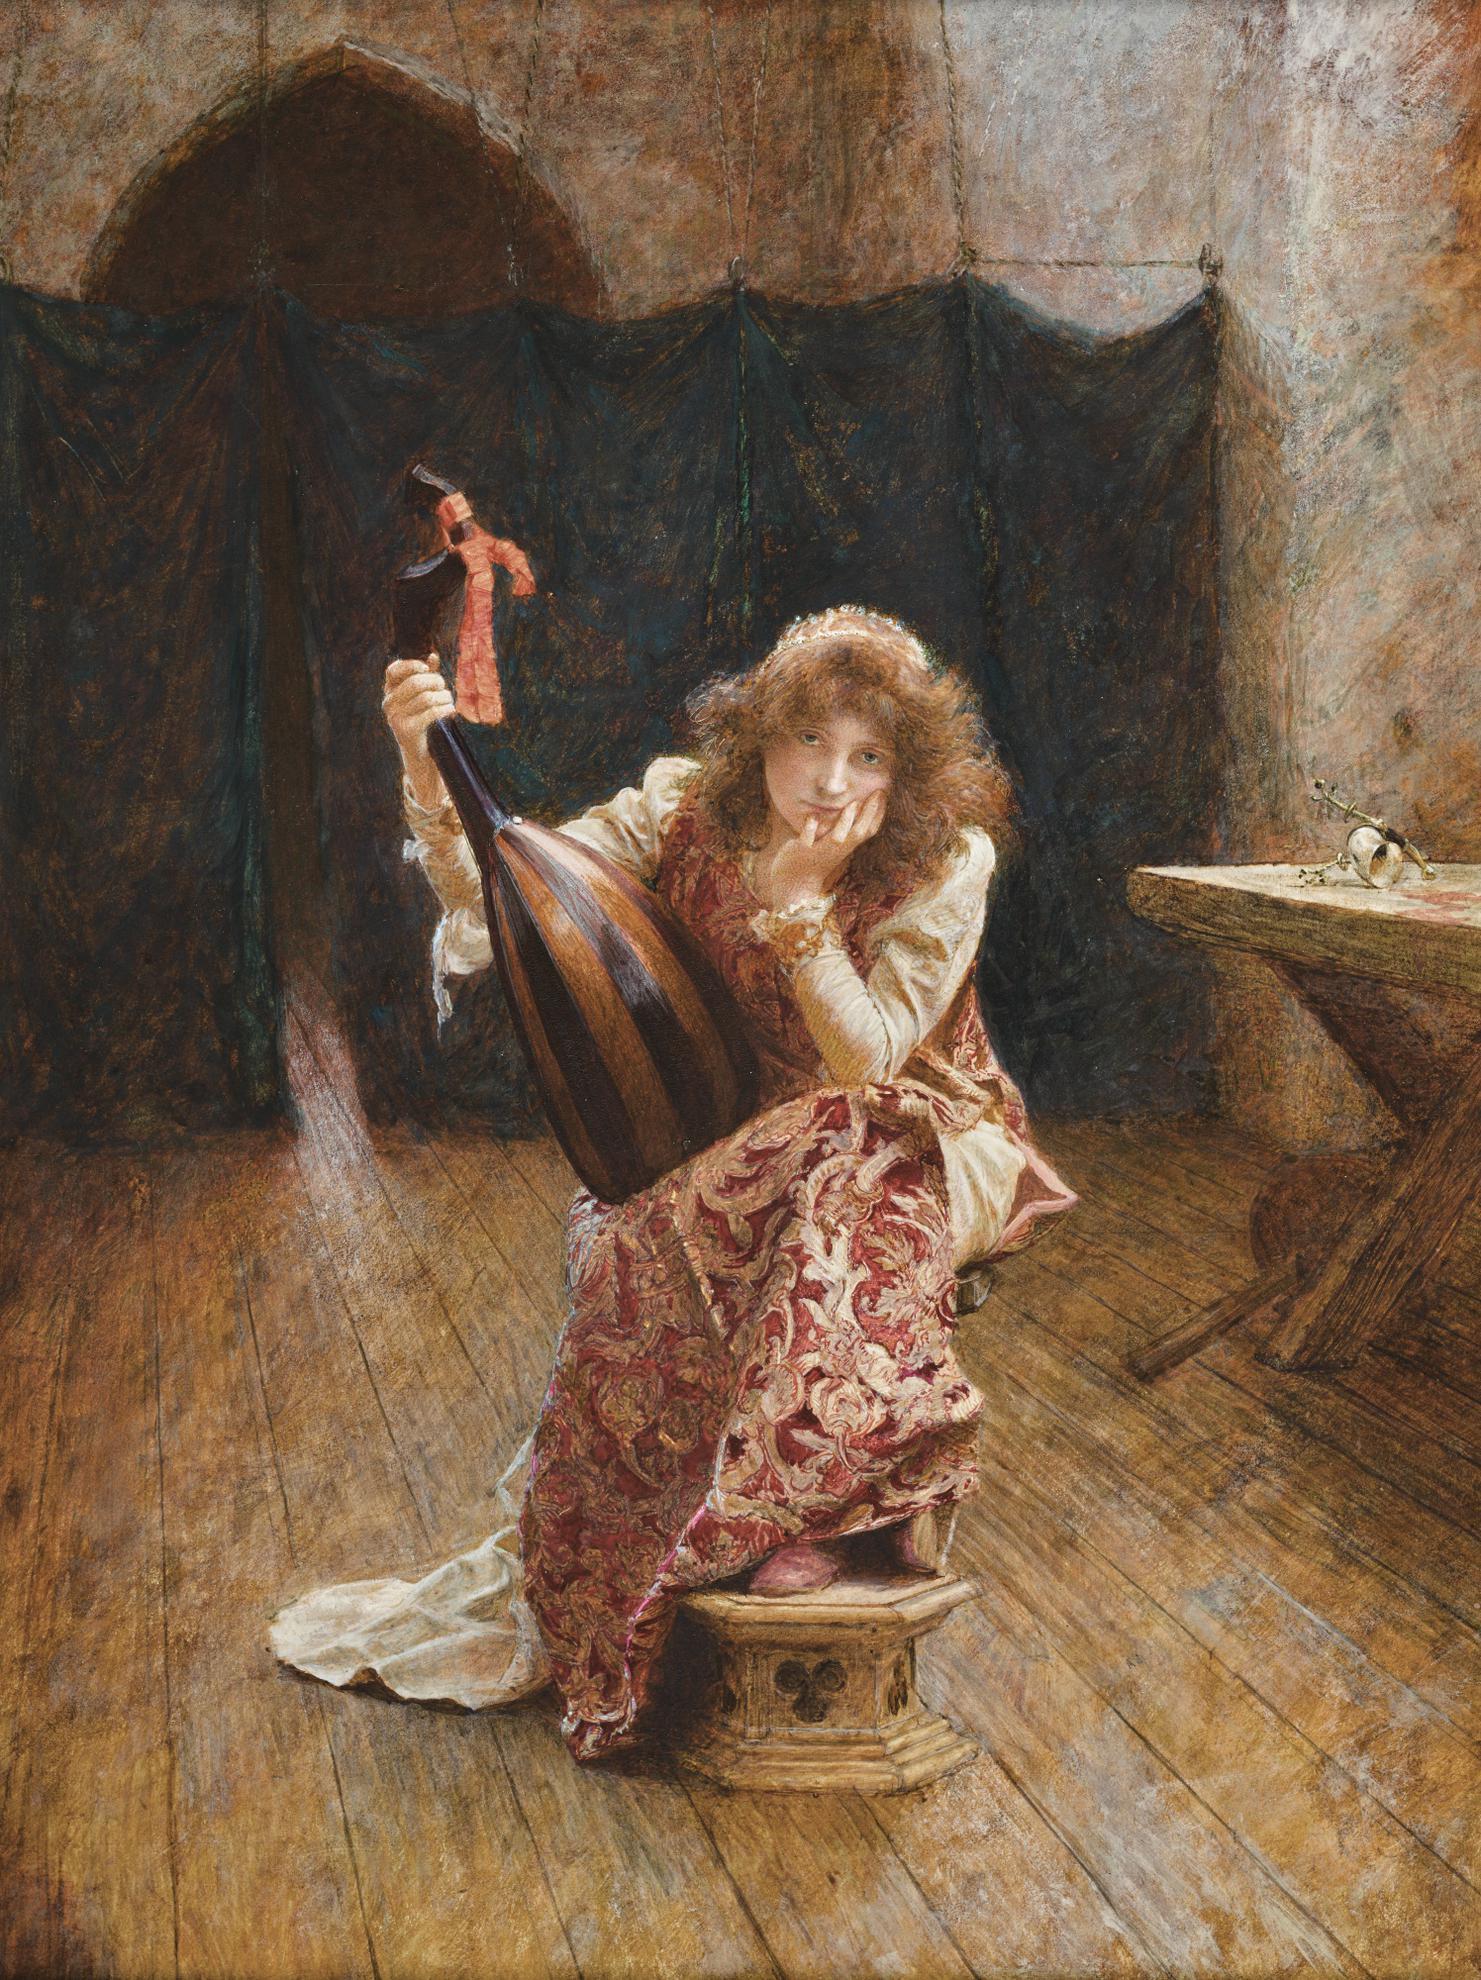 Edward John Gregory - Apres-